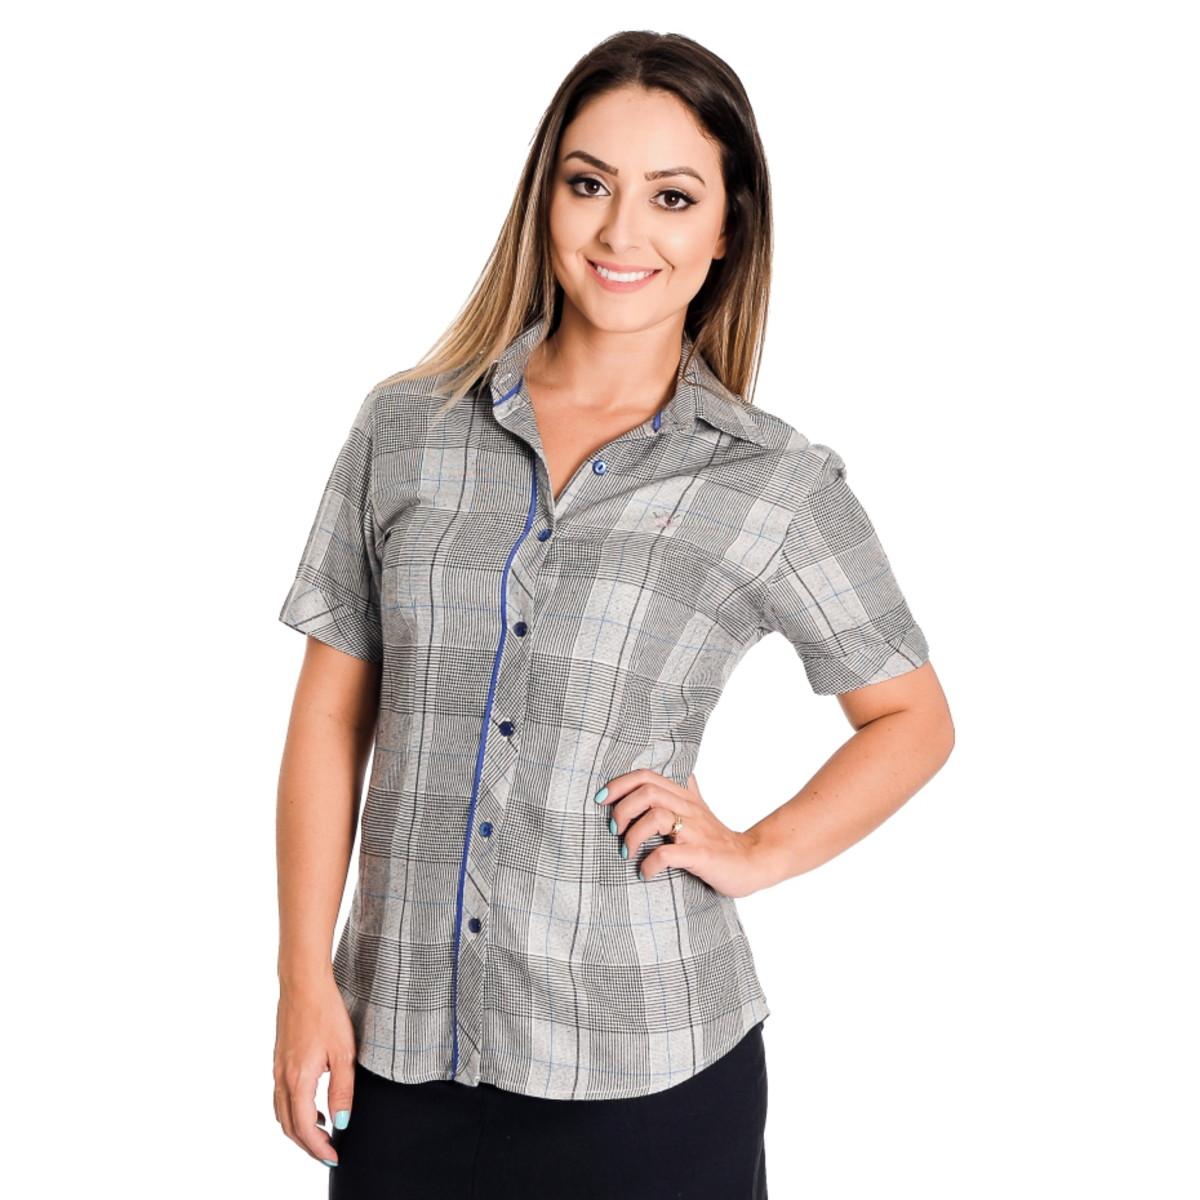 898853d5a5 Camisa Xadrez Feminina Elis - Pimenta Rosada no Elo7